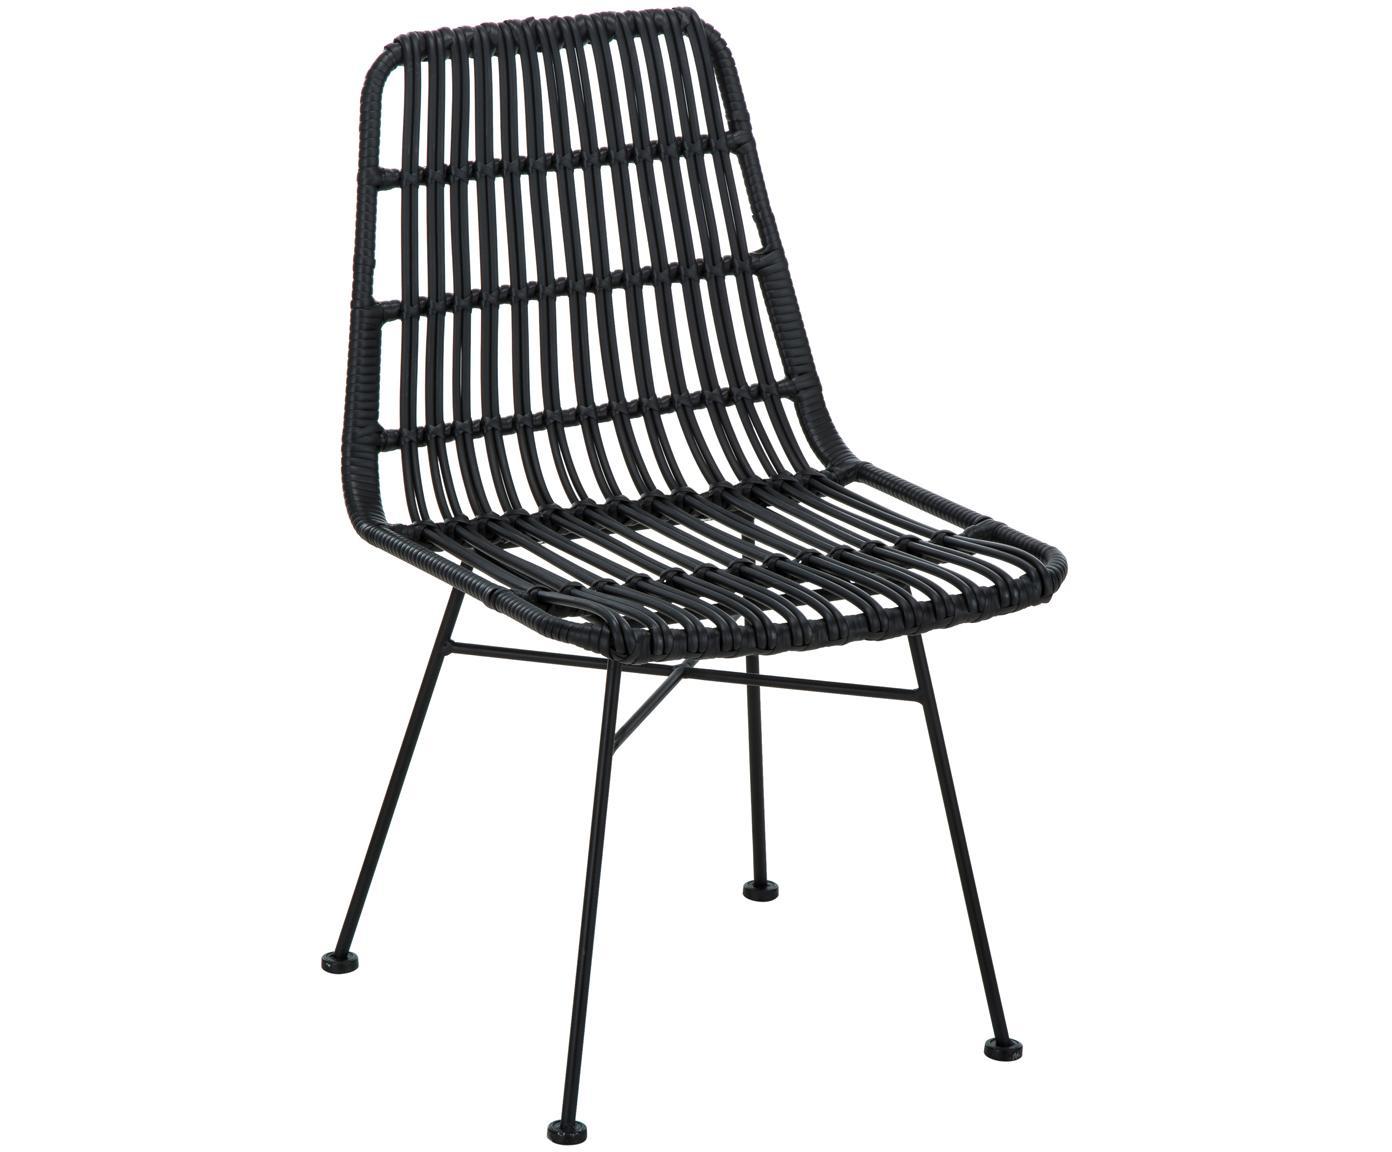 Polyrattan-Stühle Costa, 2 Stück, Sitzfläche: Polyethylen-Geflecht, Gestell: Metall, pulverbeschichtet, Schwarz, B 47 x T 62 cm